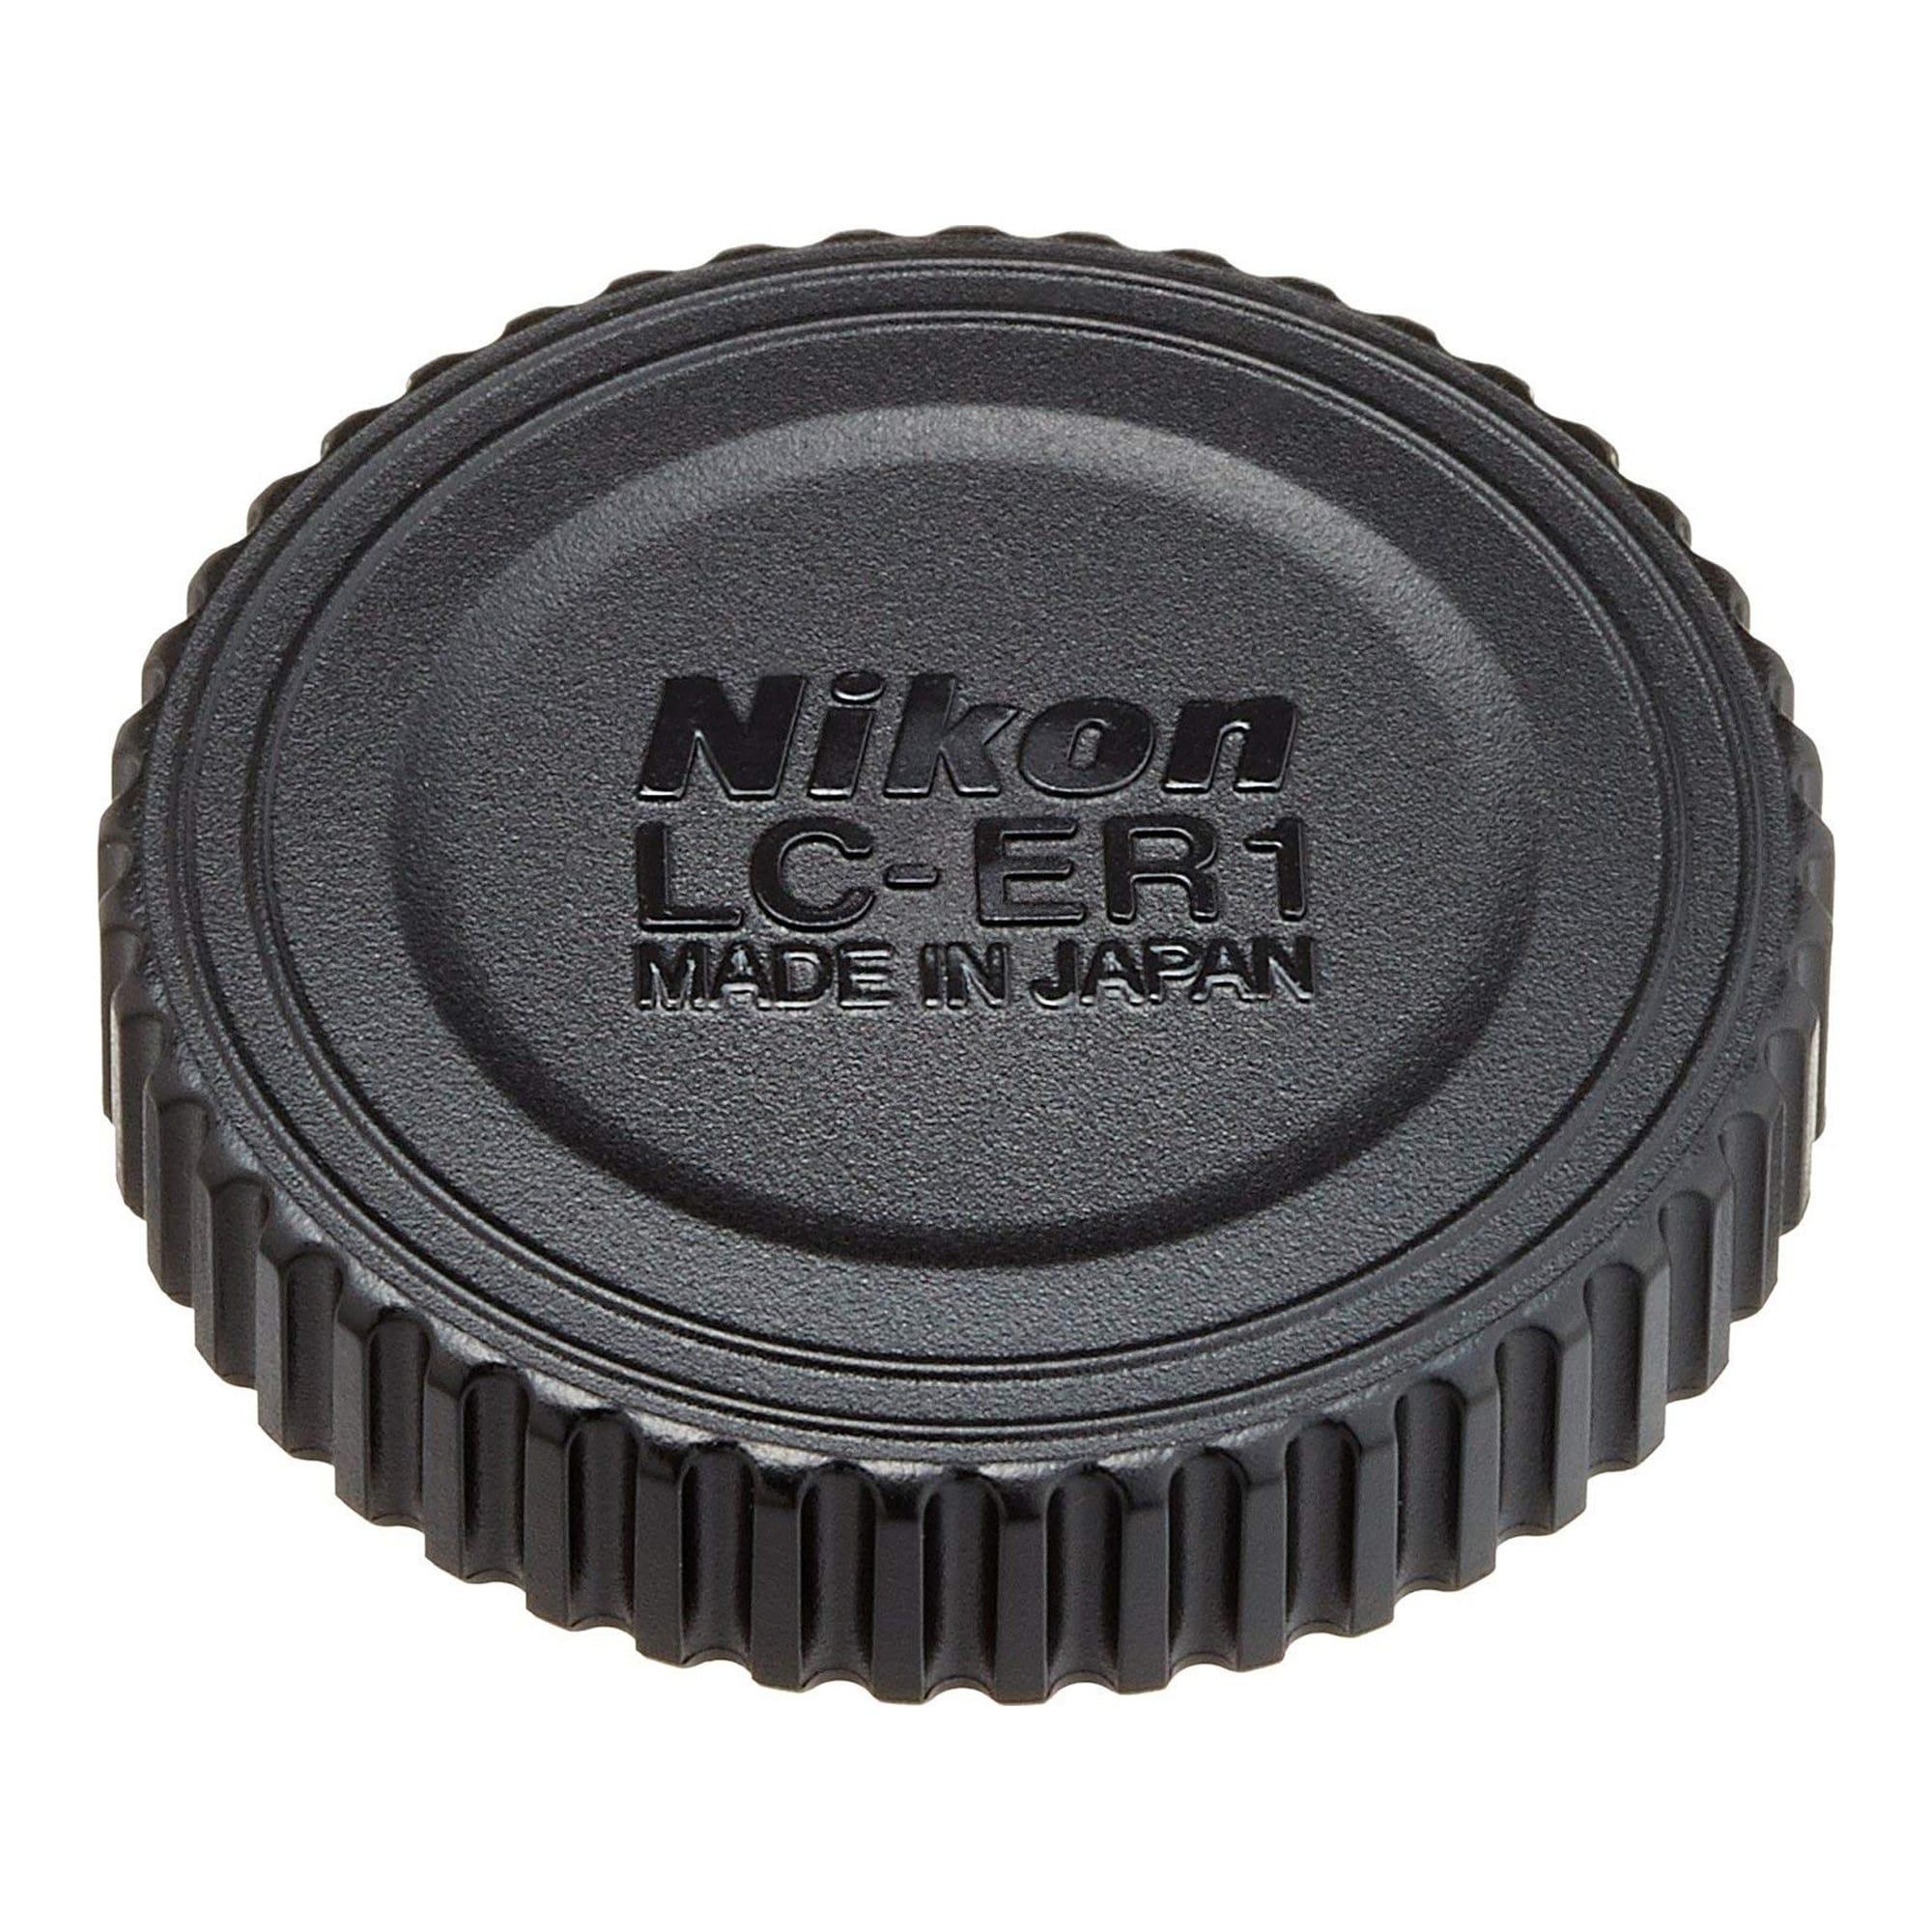 Nikon LC-ER1 Bakre Objektivlock